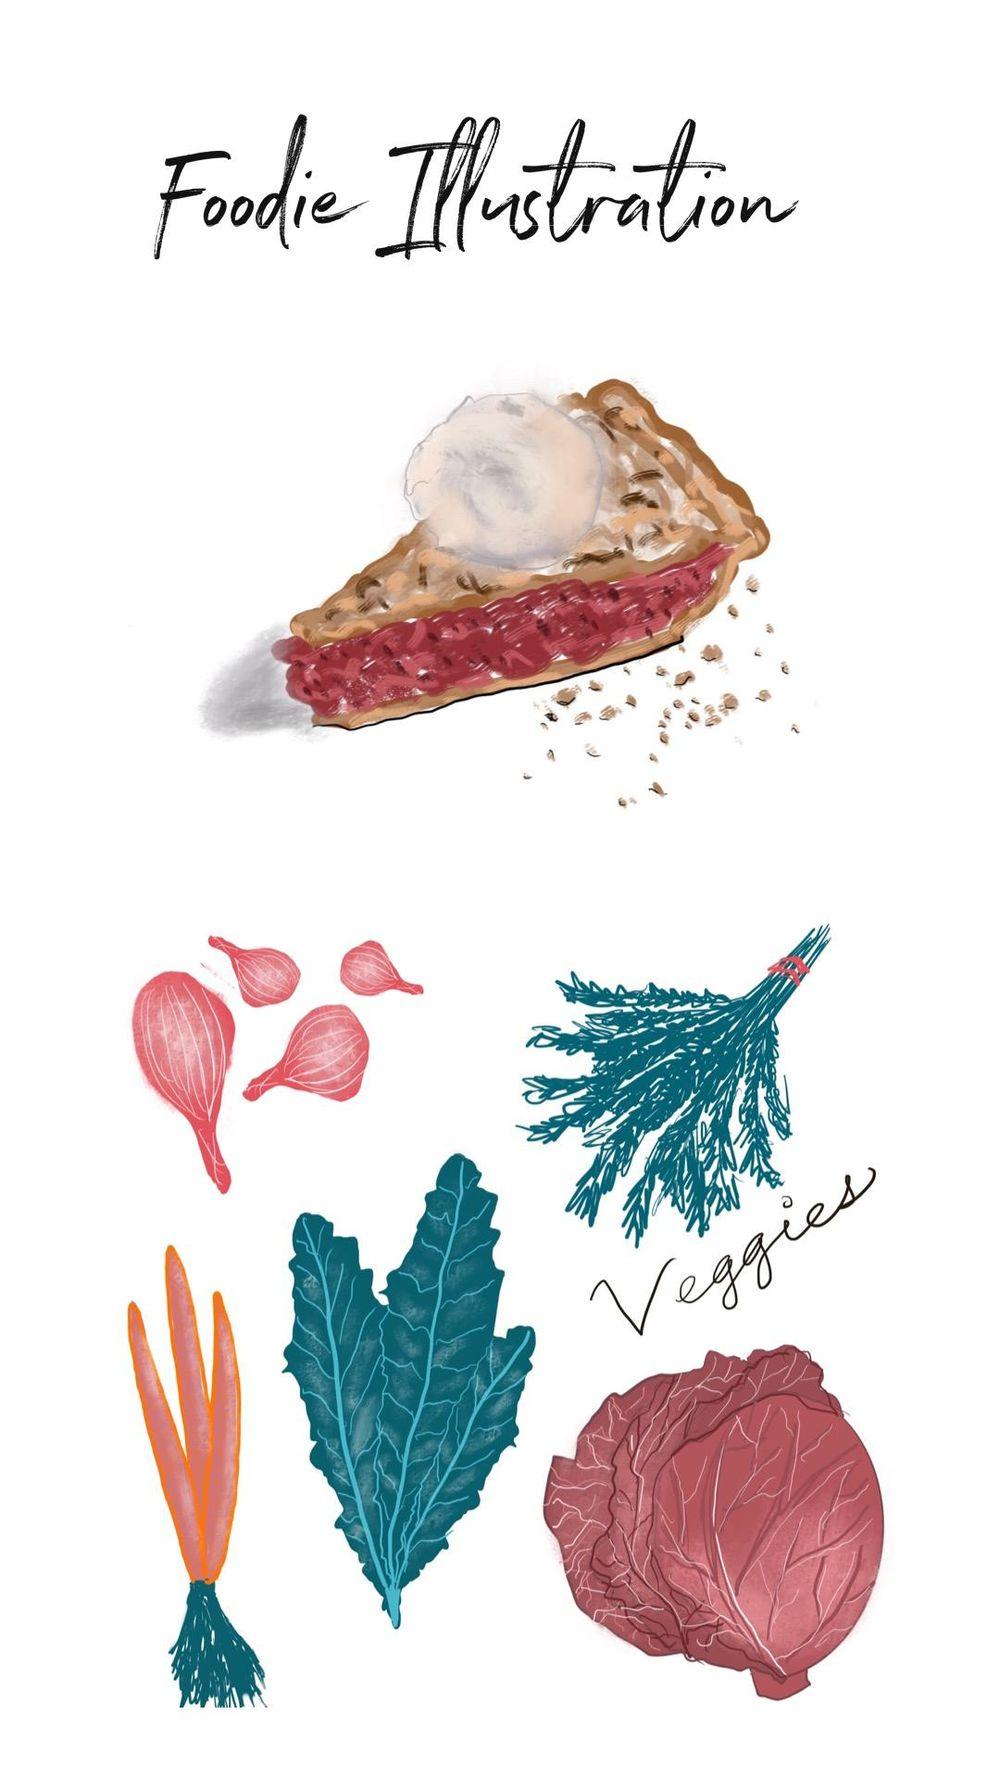 New December Color Palette - image 5 - student project